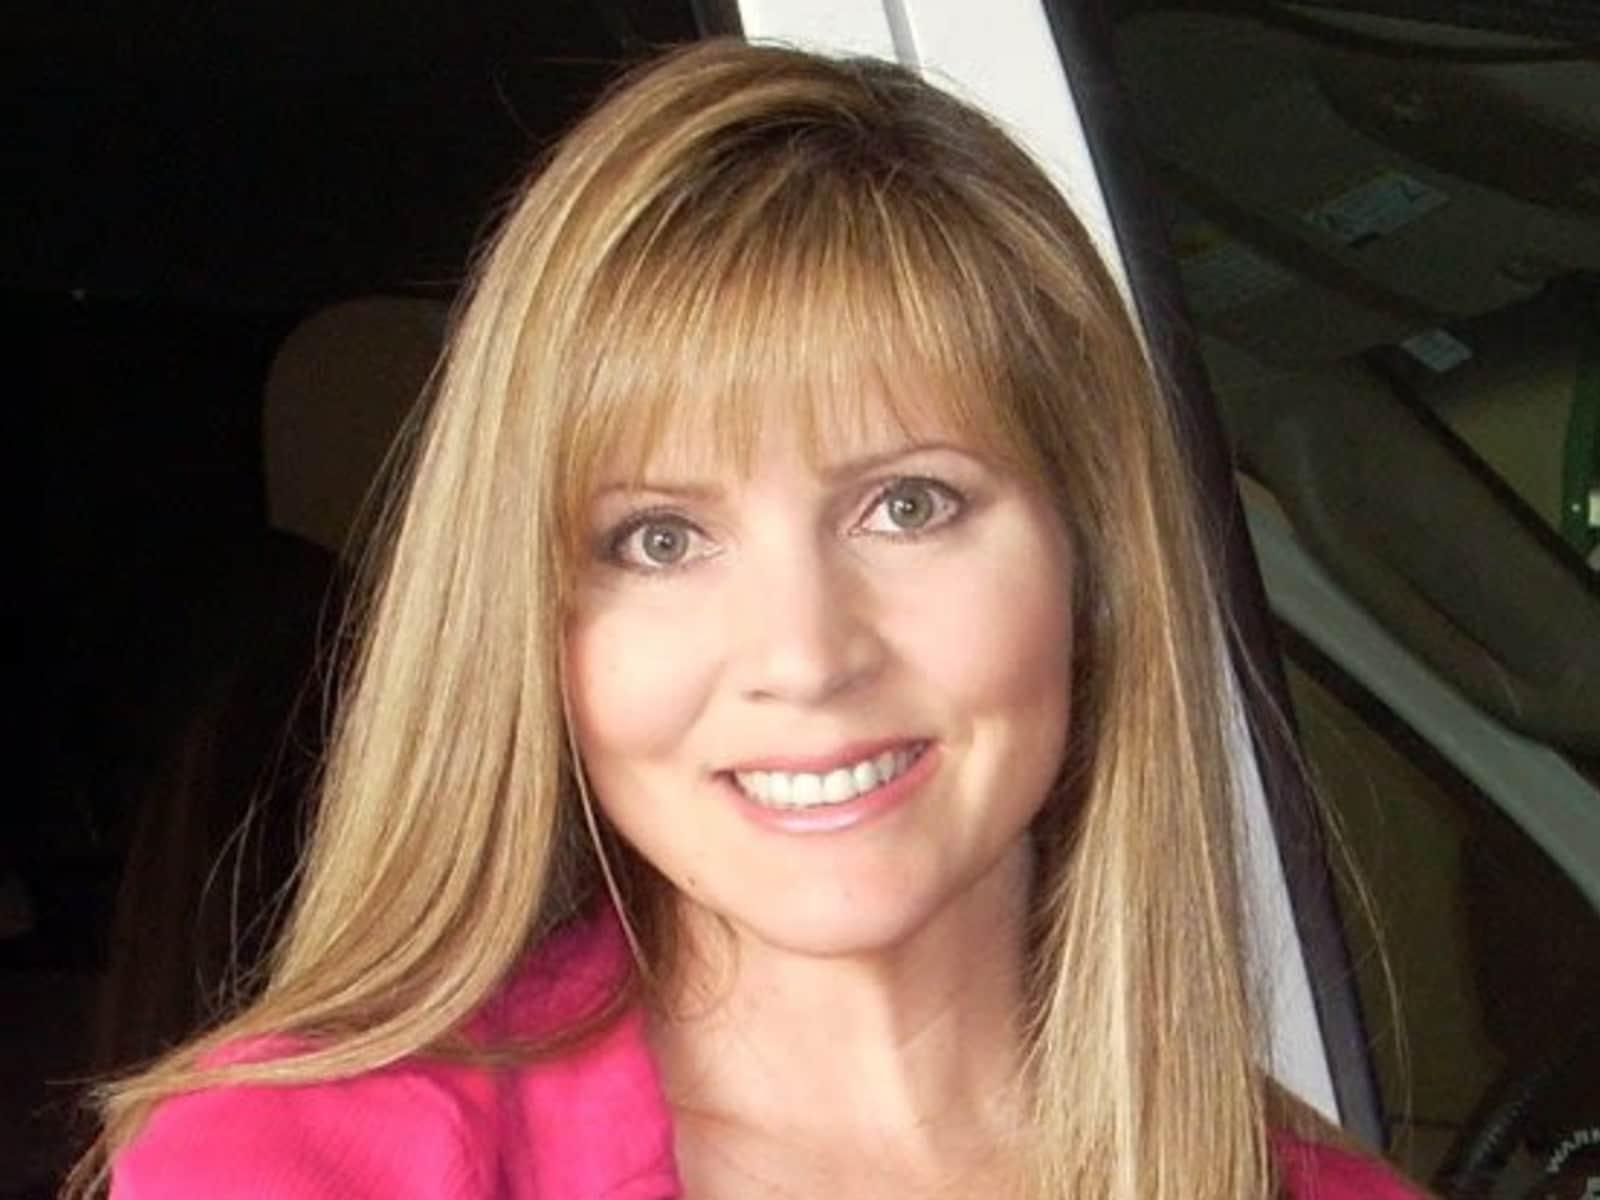 Kristina from Tucson, Arizona, United States